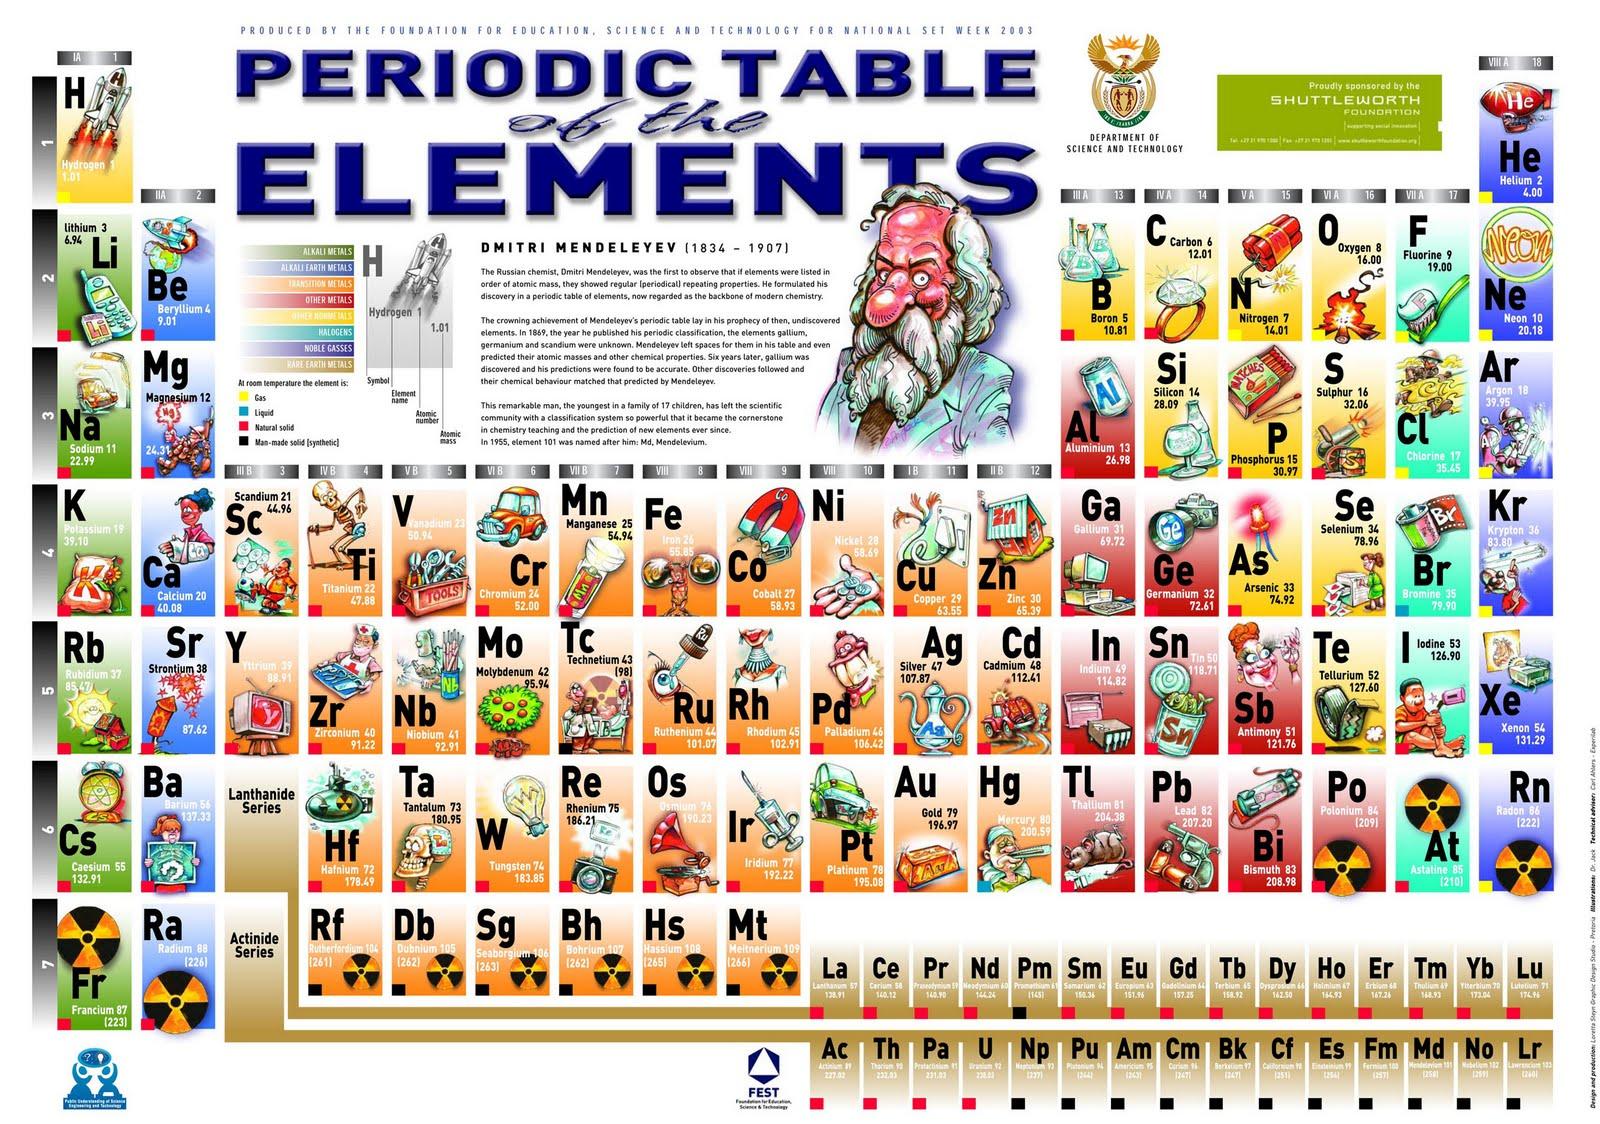 Mafyq la tabla peridica la tabla peridica urtaz Choice Image